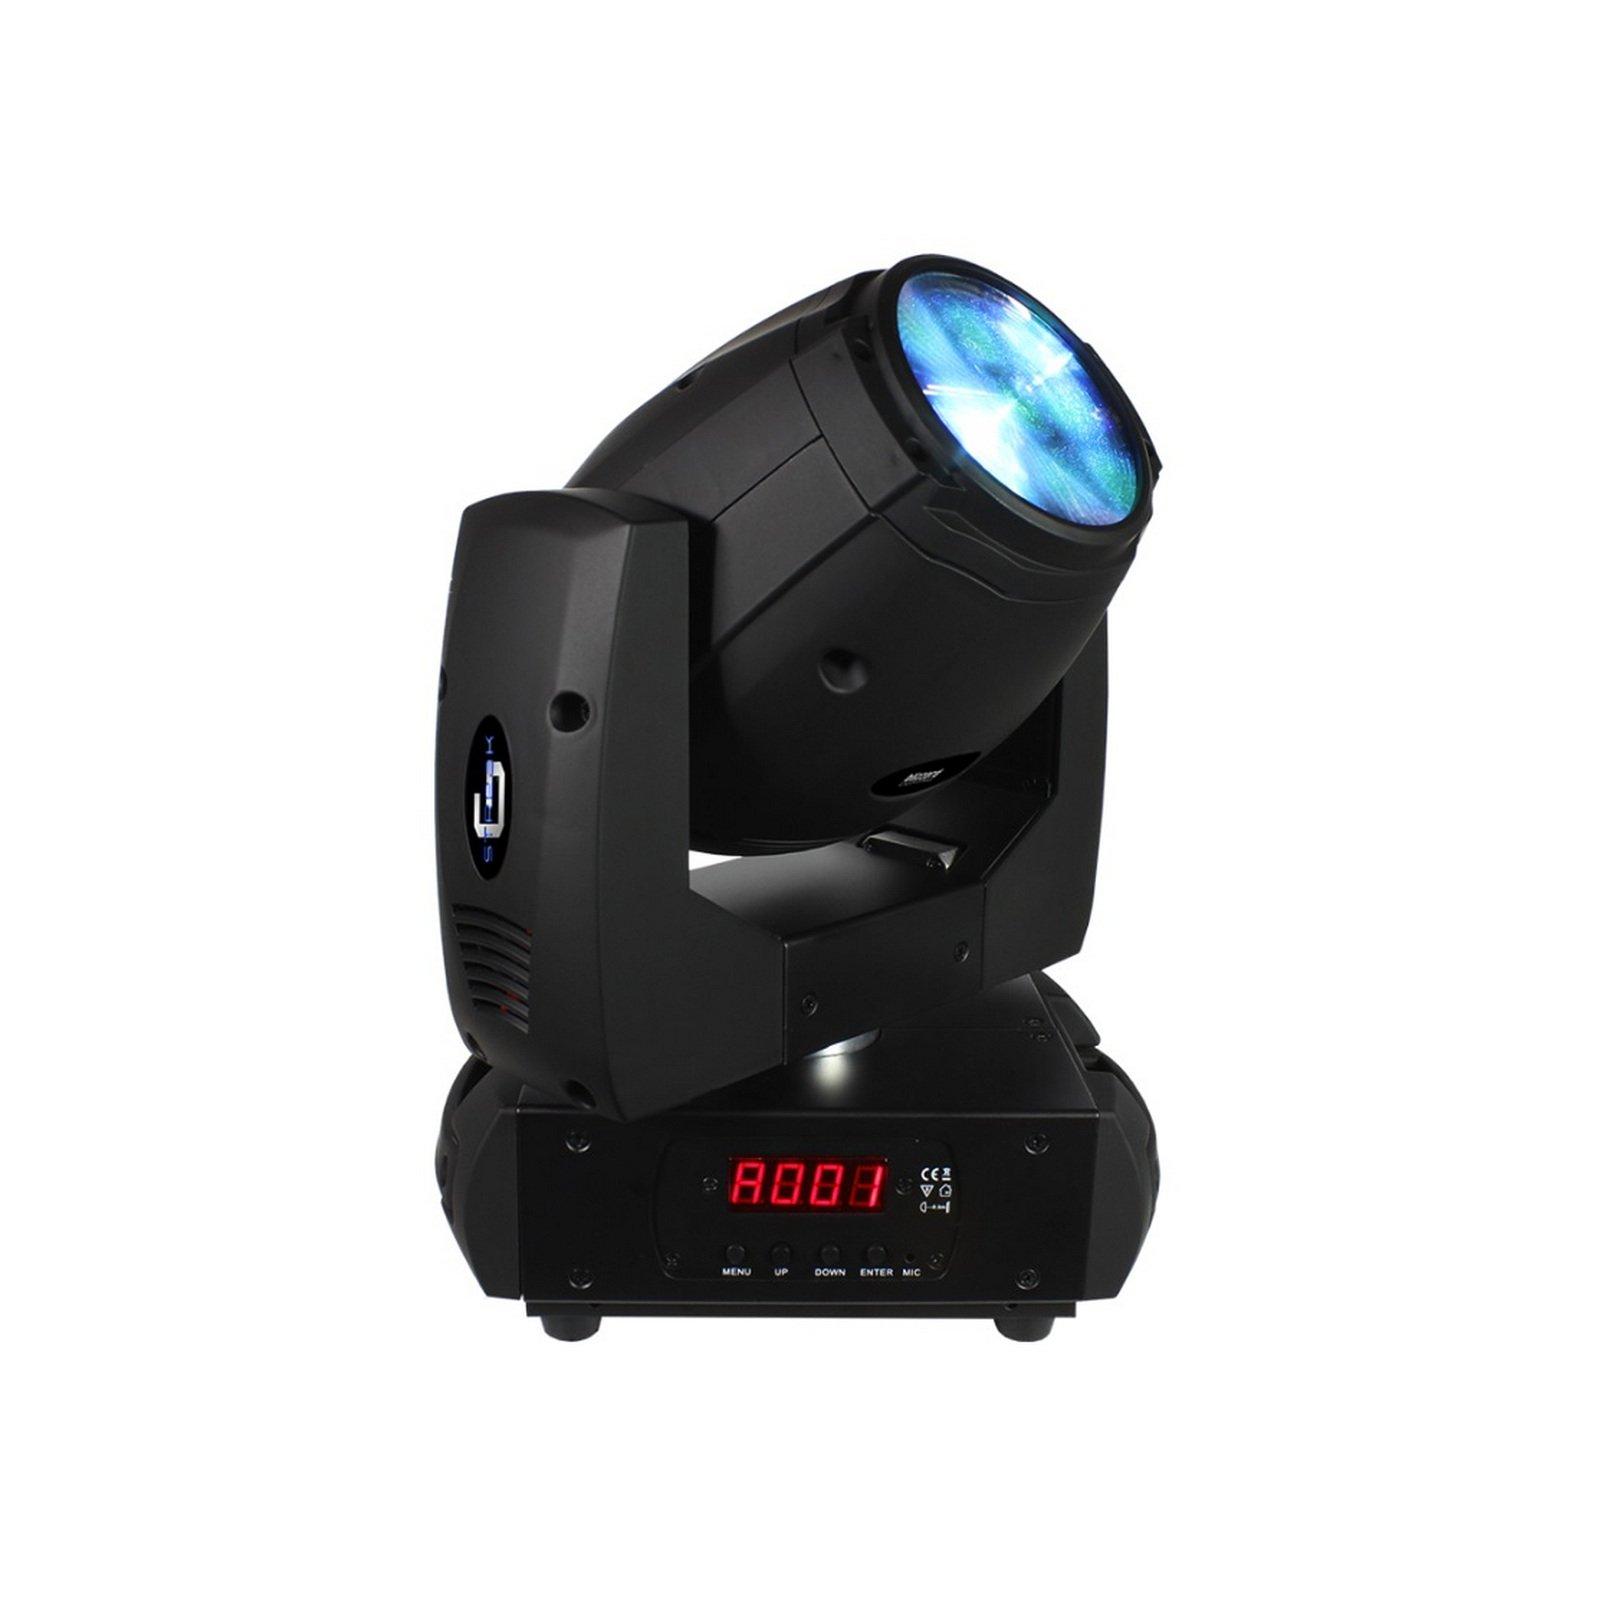 Blizzard Lighting G-Streak   50w LED Moving Head Spot Fixture